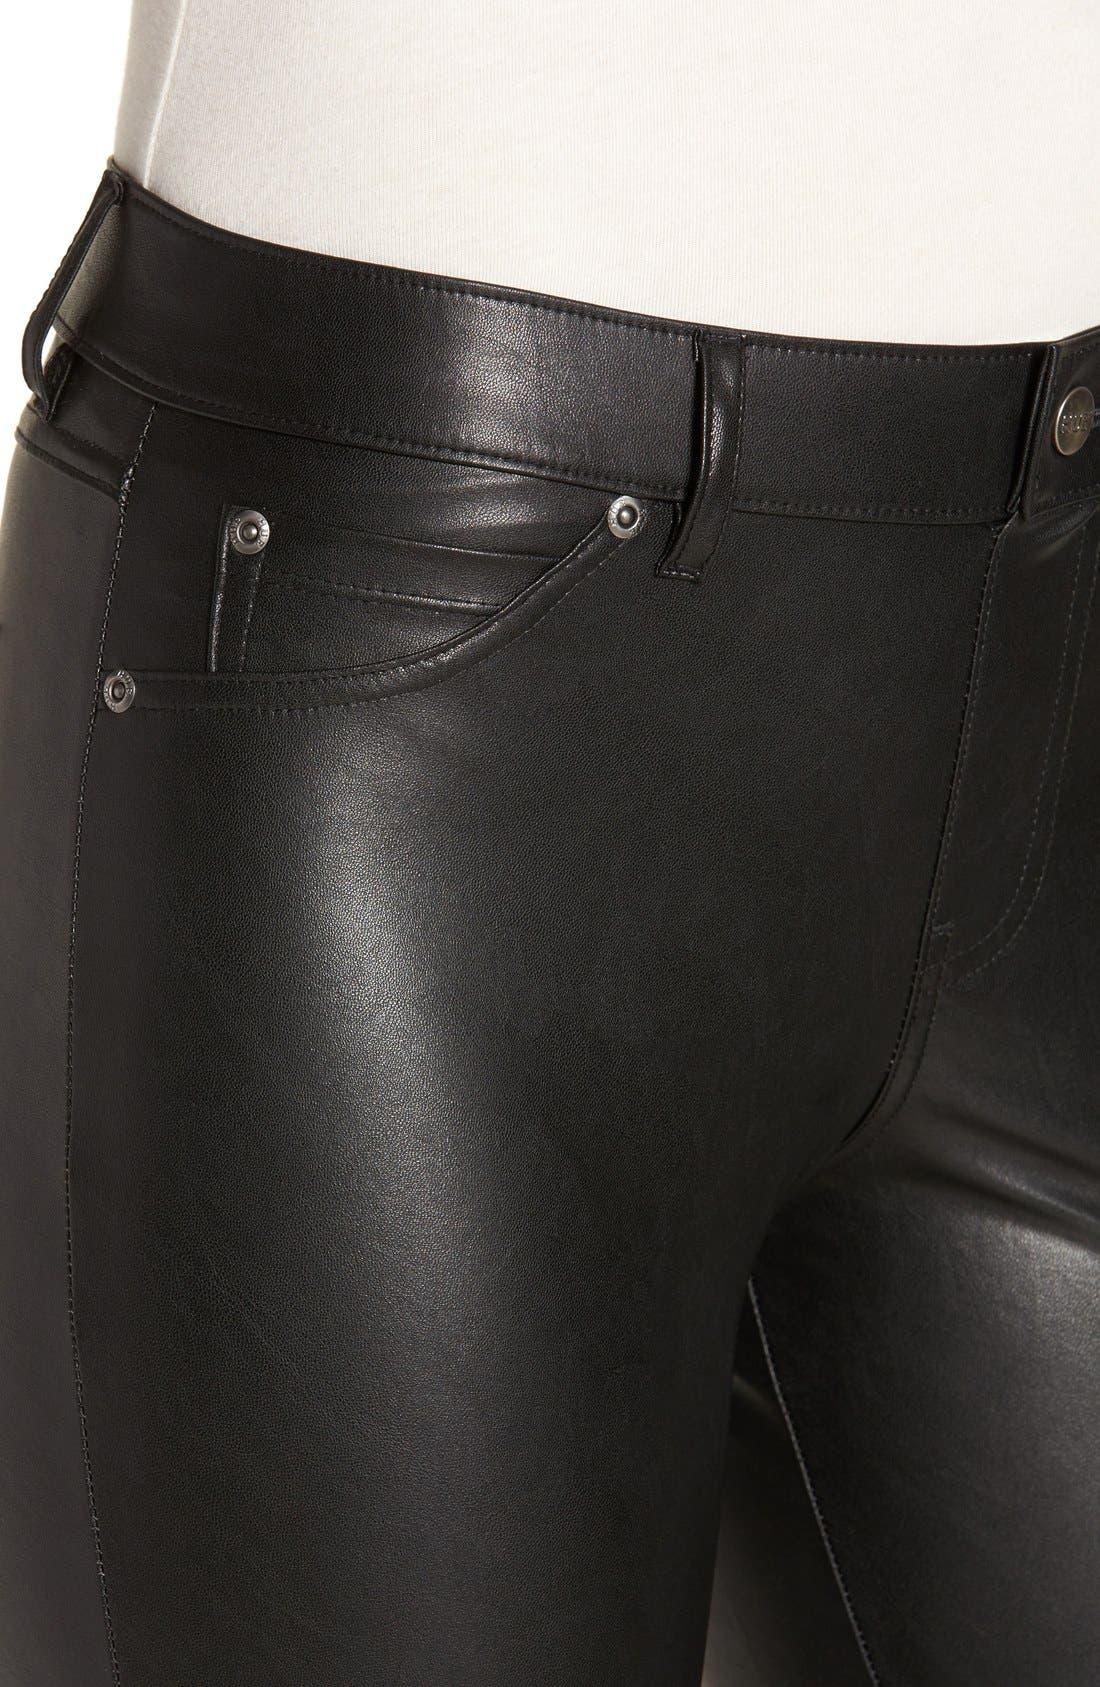 'Leatherette' Faux Leather Leggings,                             Alternate thumbnail 3, color,                             001